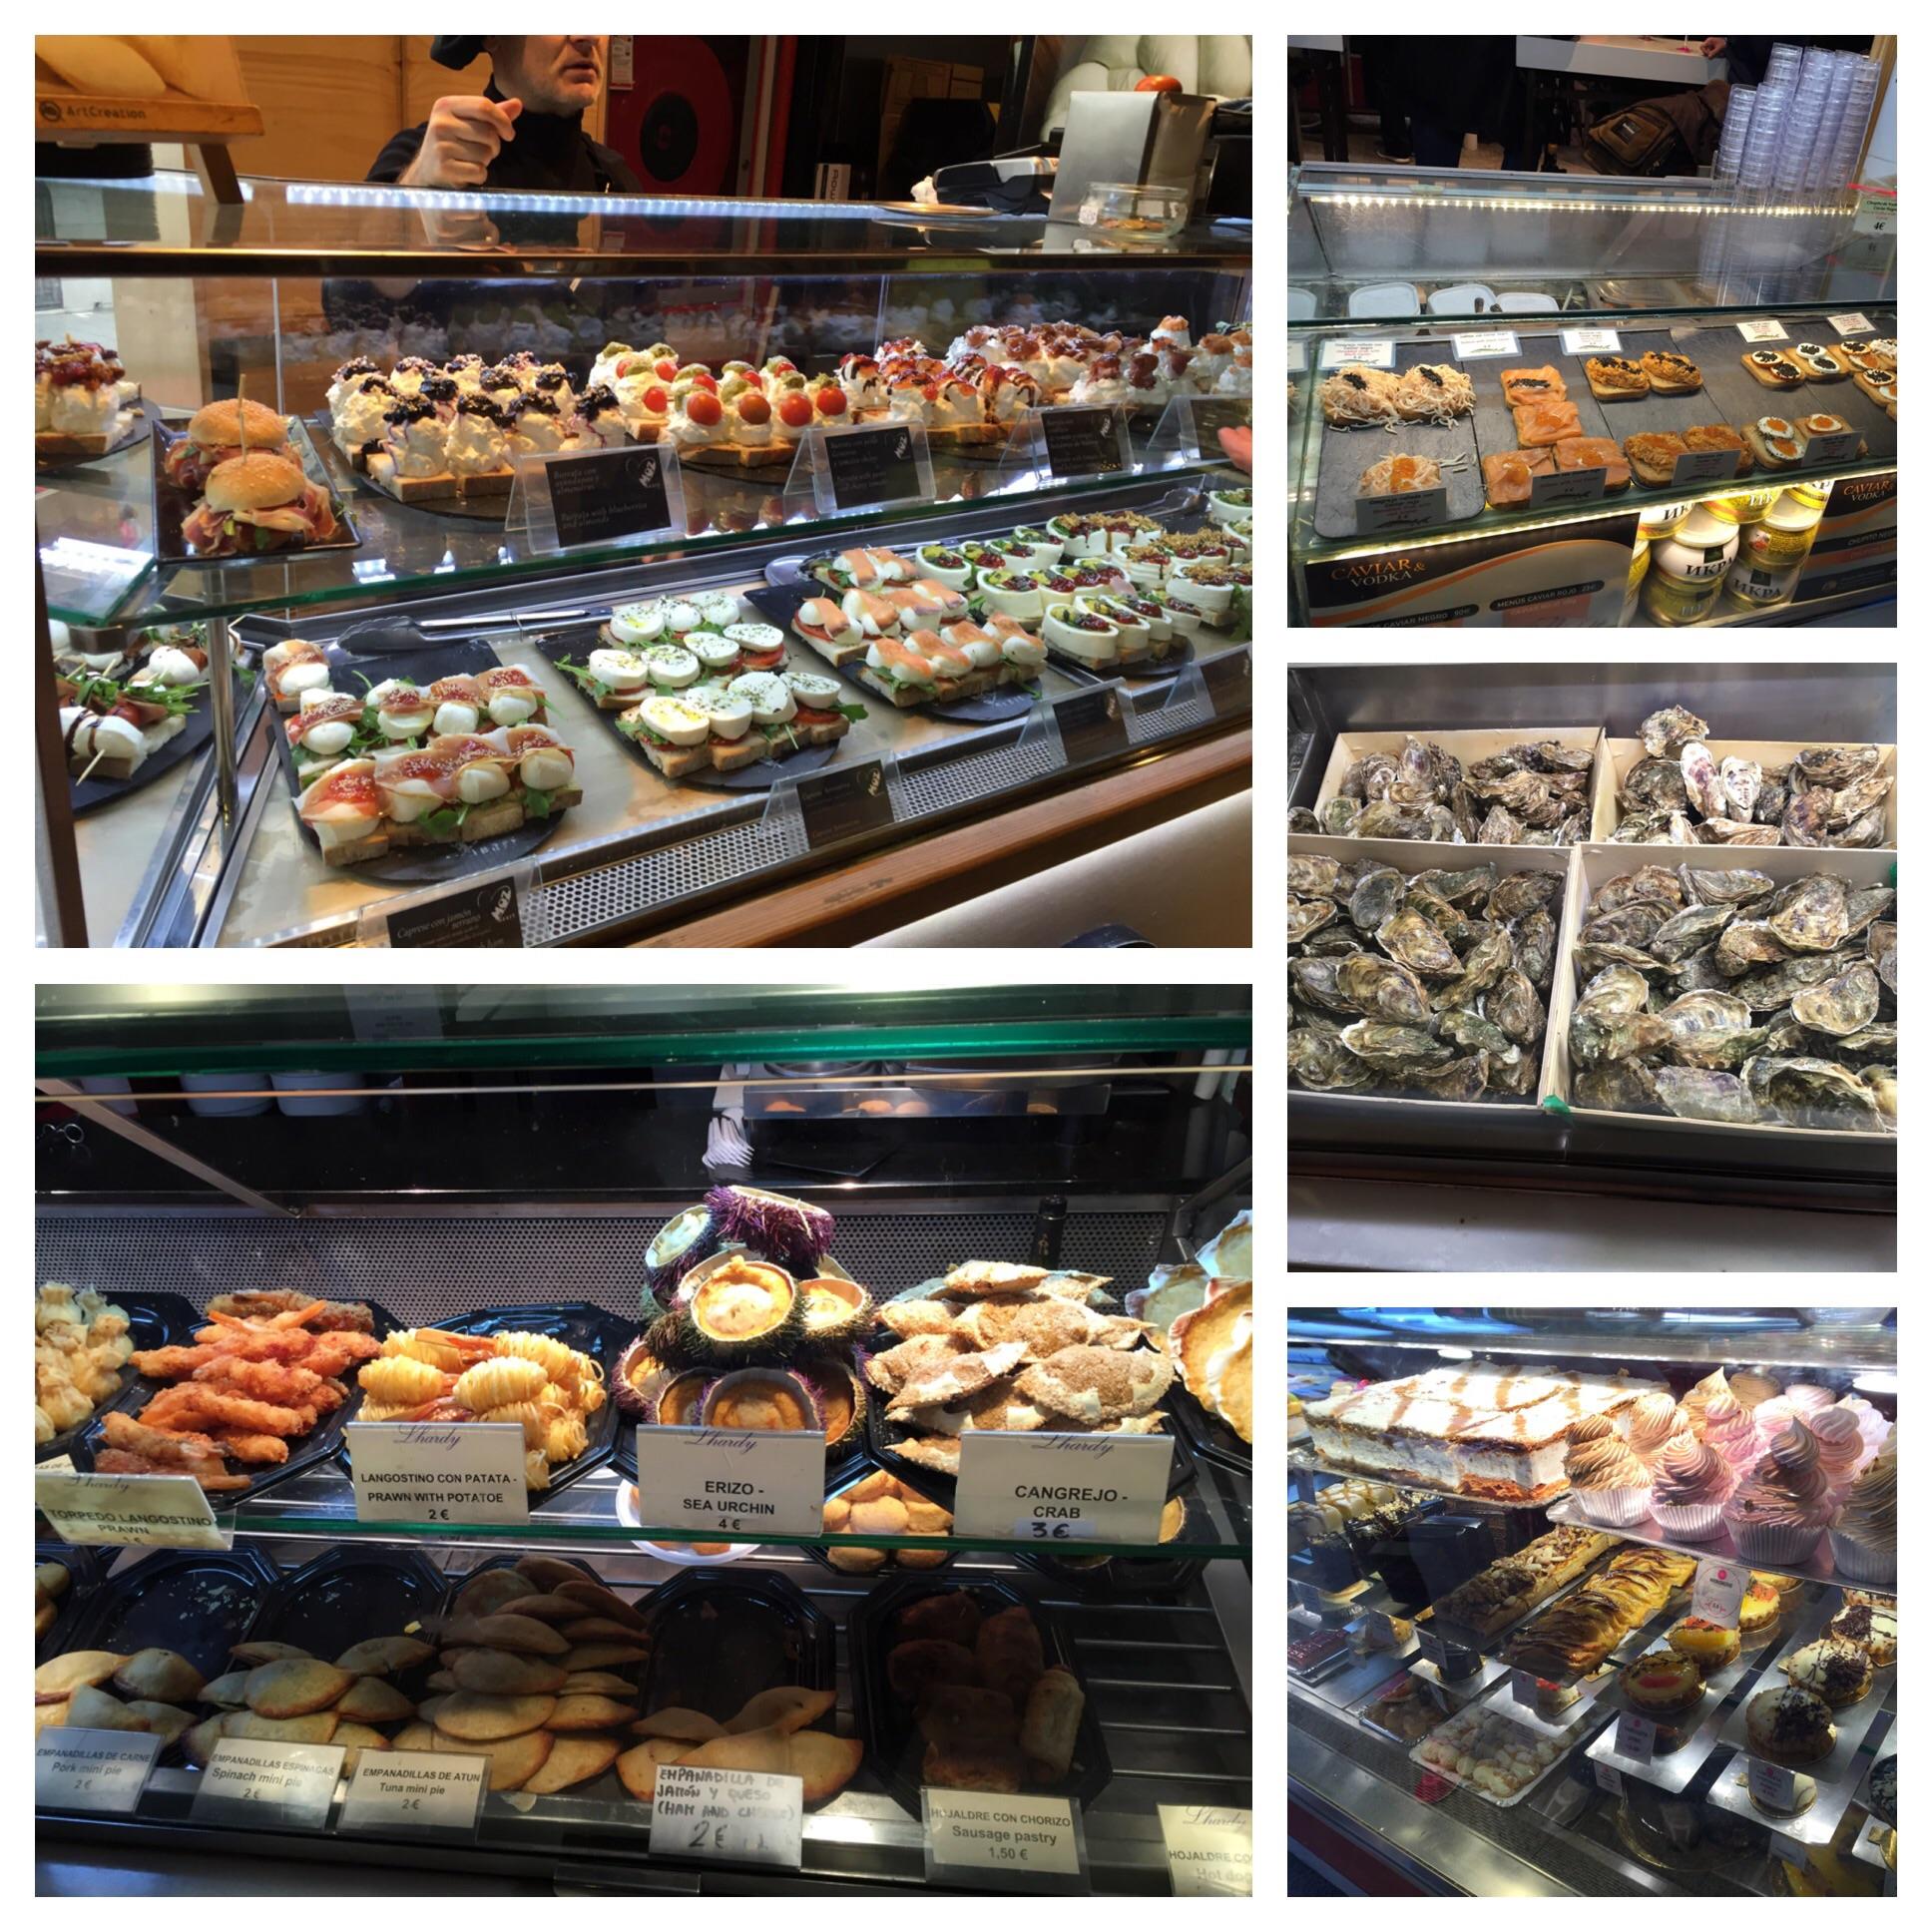 Fresh mozzarella bar, caviar bar, oysters, desserts, quiche's and empanadas. And there were actually lots more!!